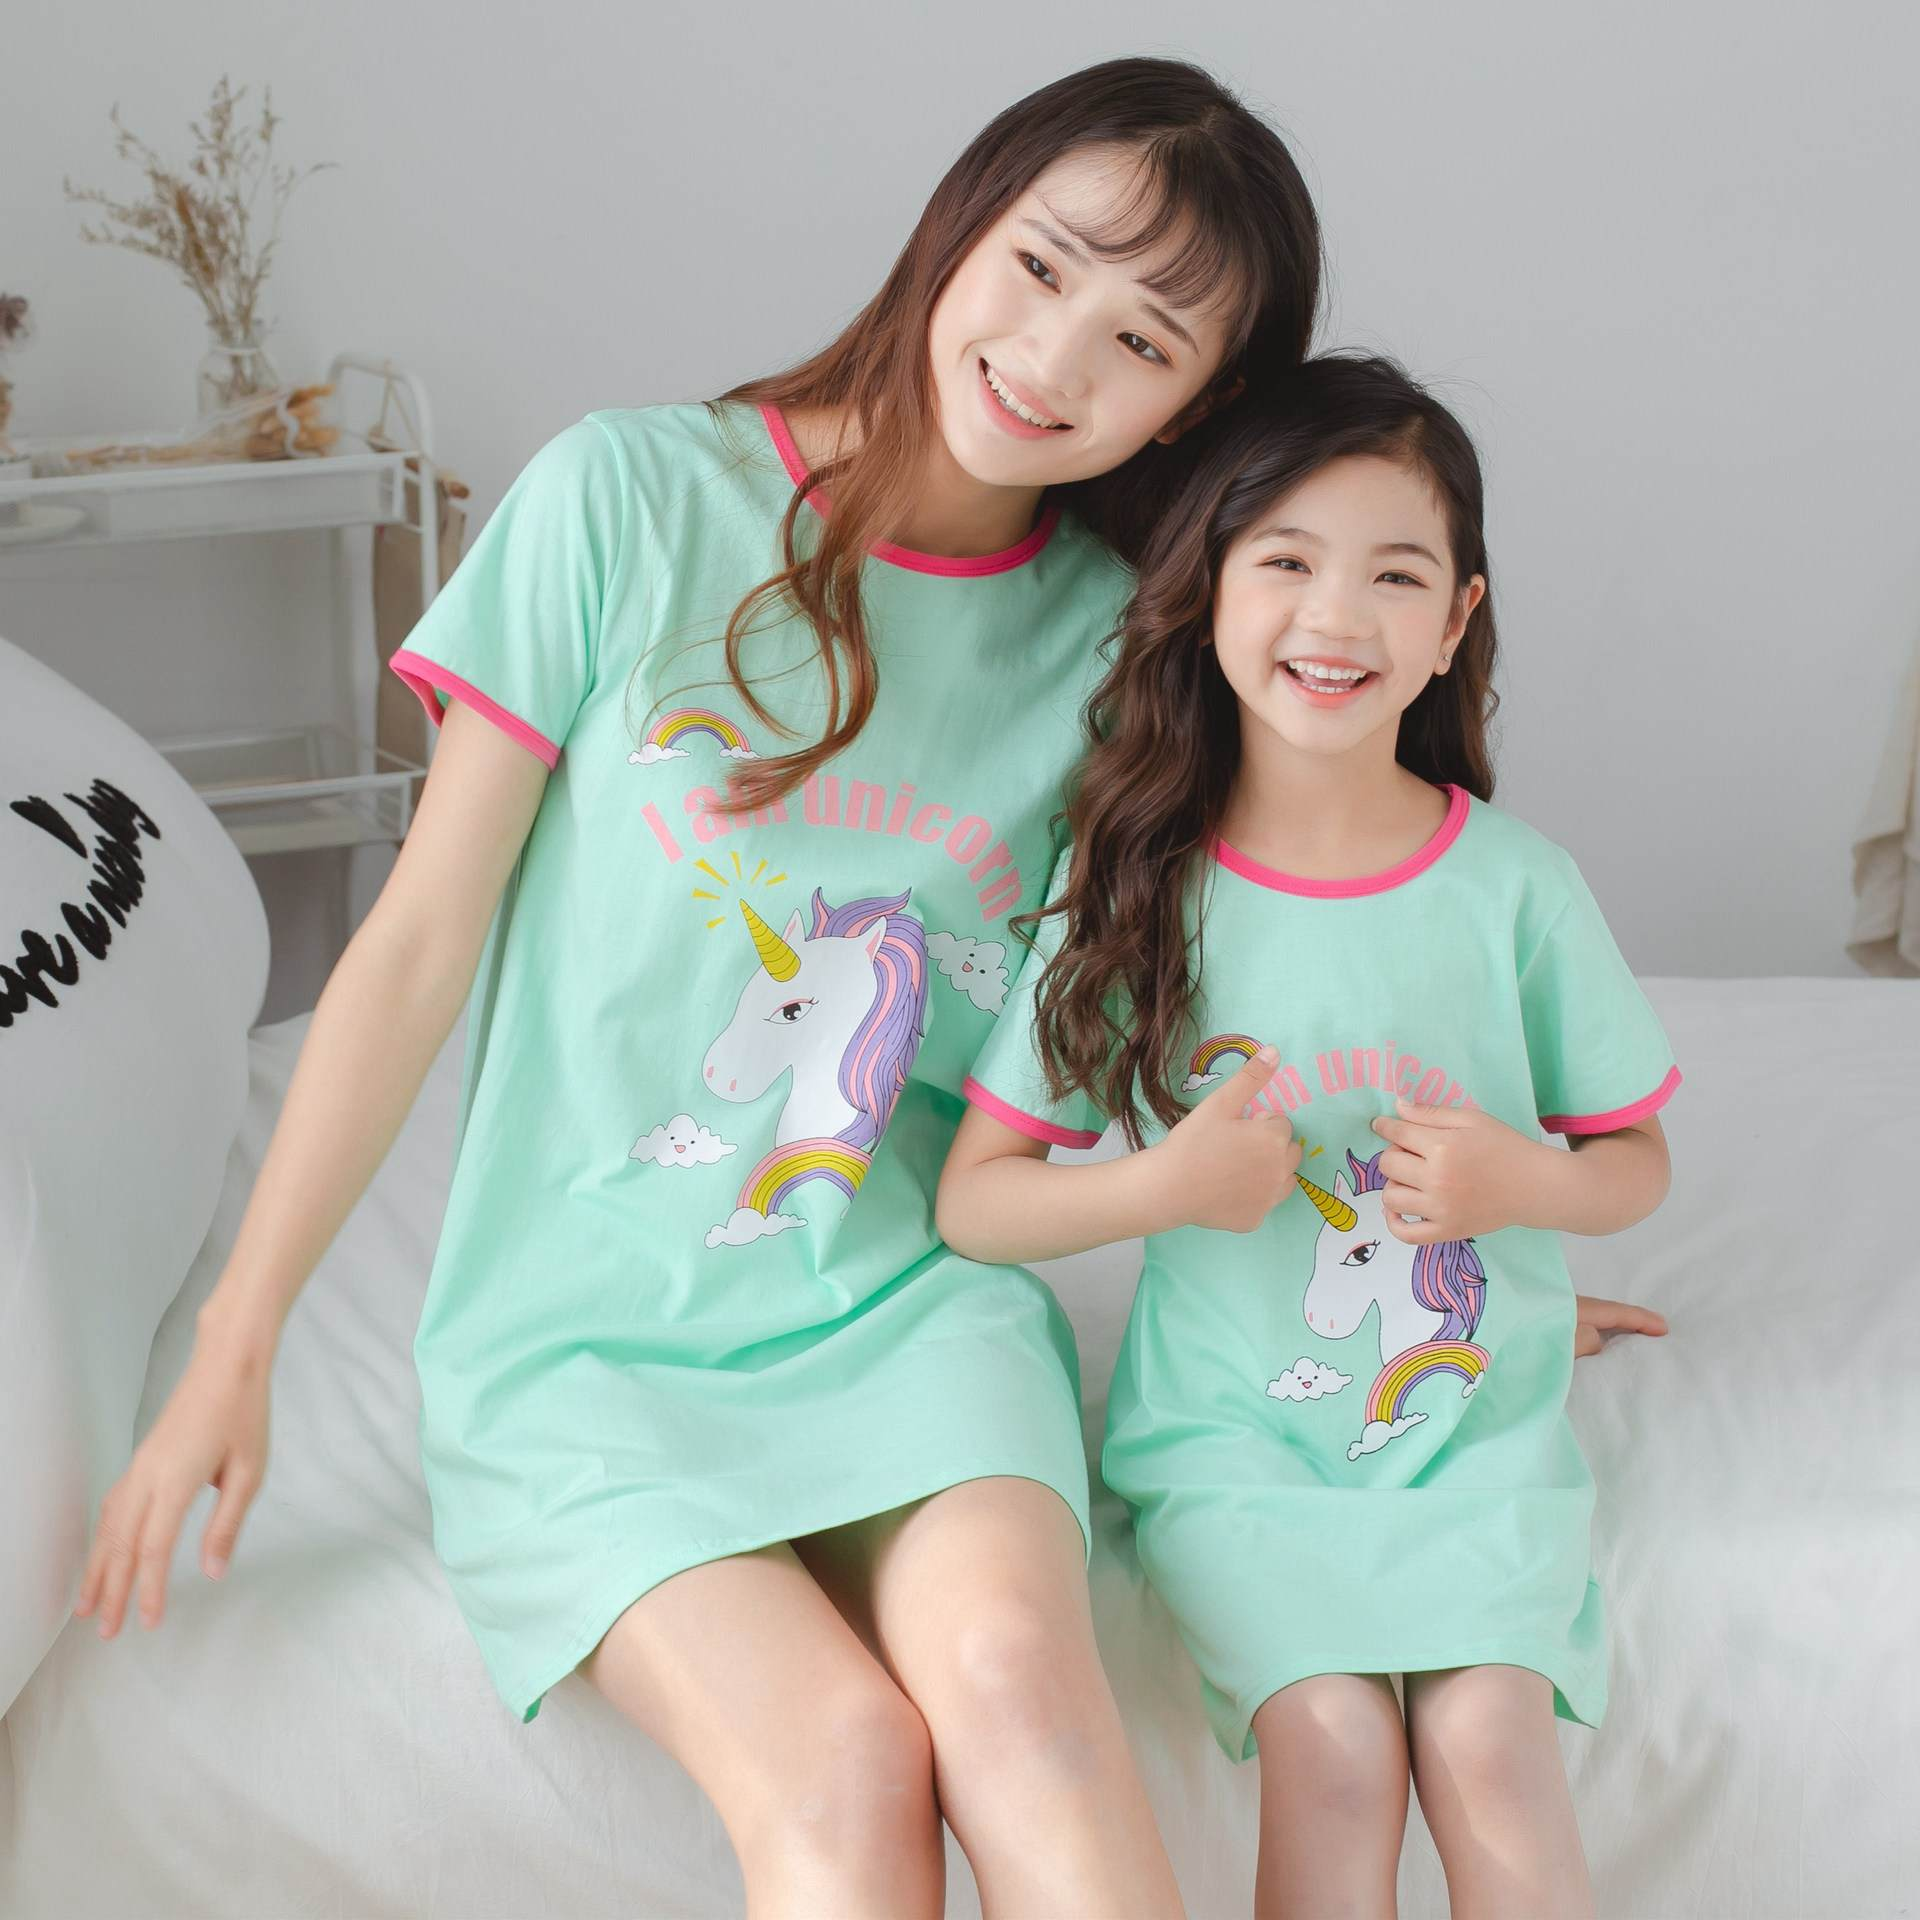 100% Cotton Girls Nightgown Pajamas Children's Summer Nightdress Baby Girls Home Clothes Mother Kids Night dress Girl Sleepwear 1